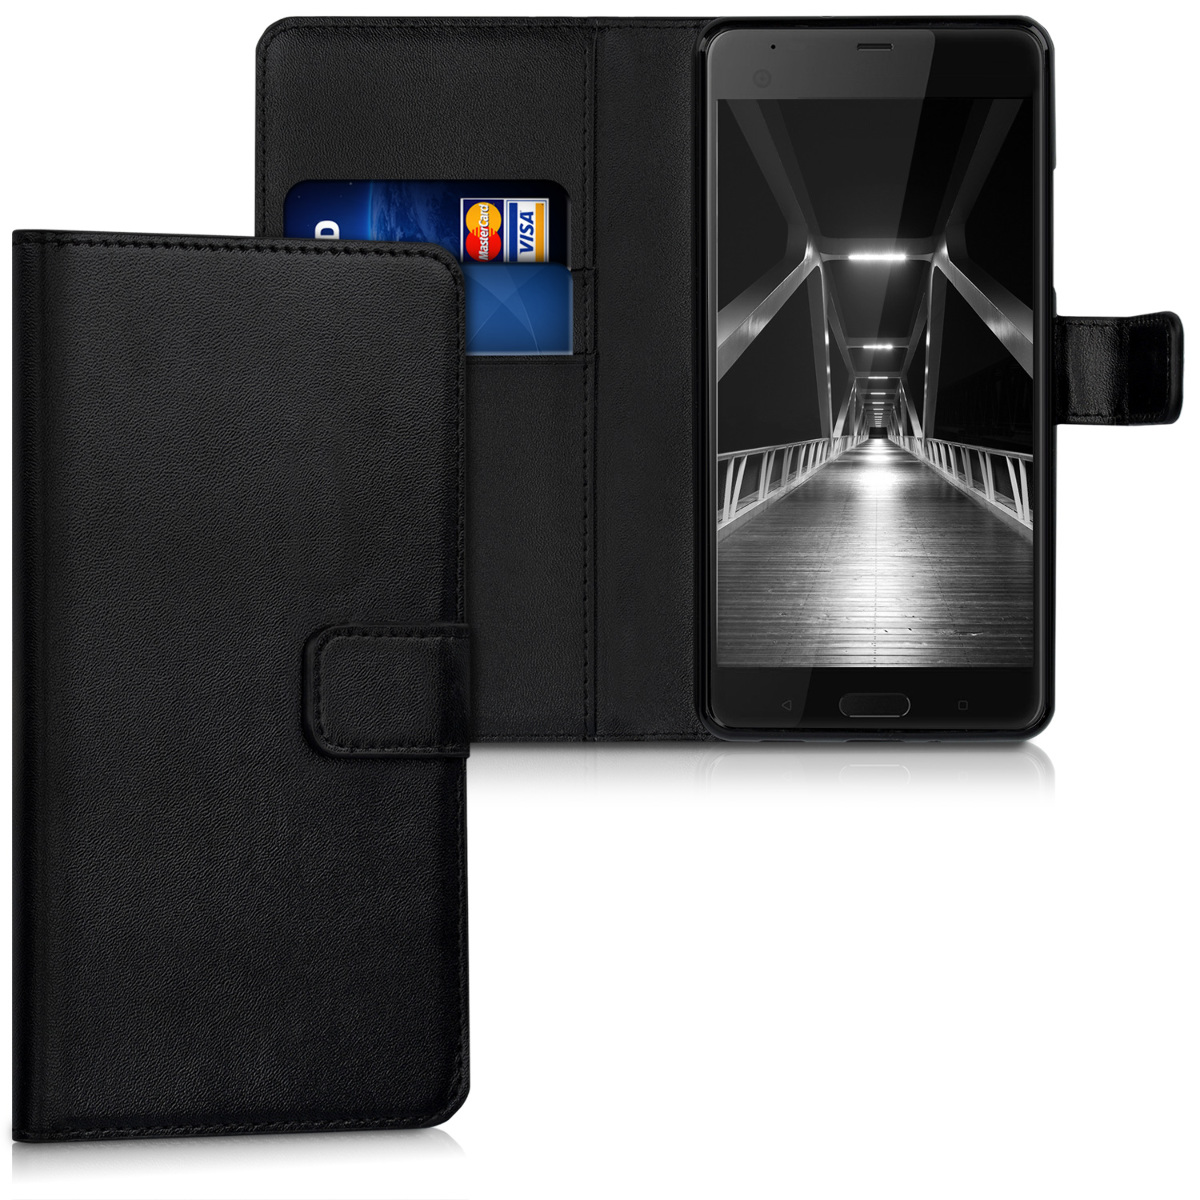 KW Θήκη - Πορτοφόλι HTC U Ultra - Black (40751.01)